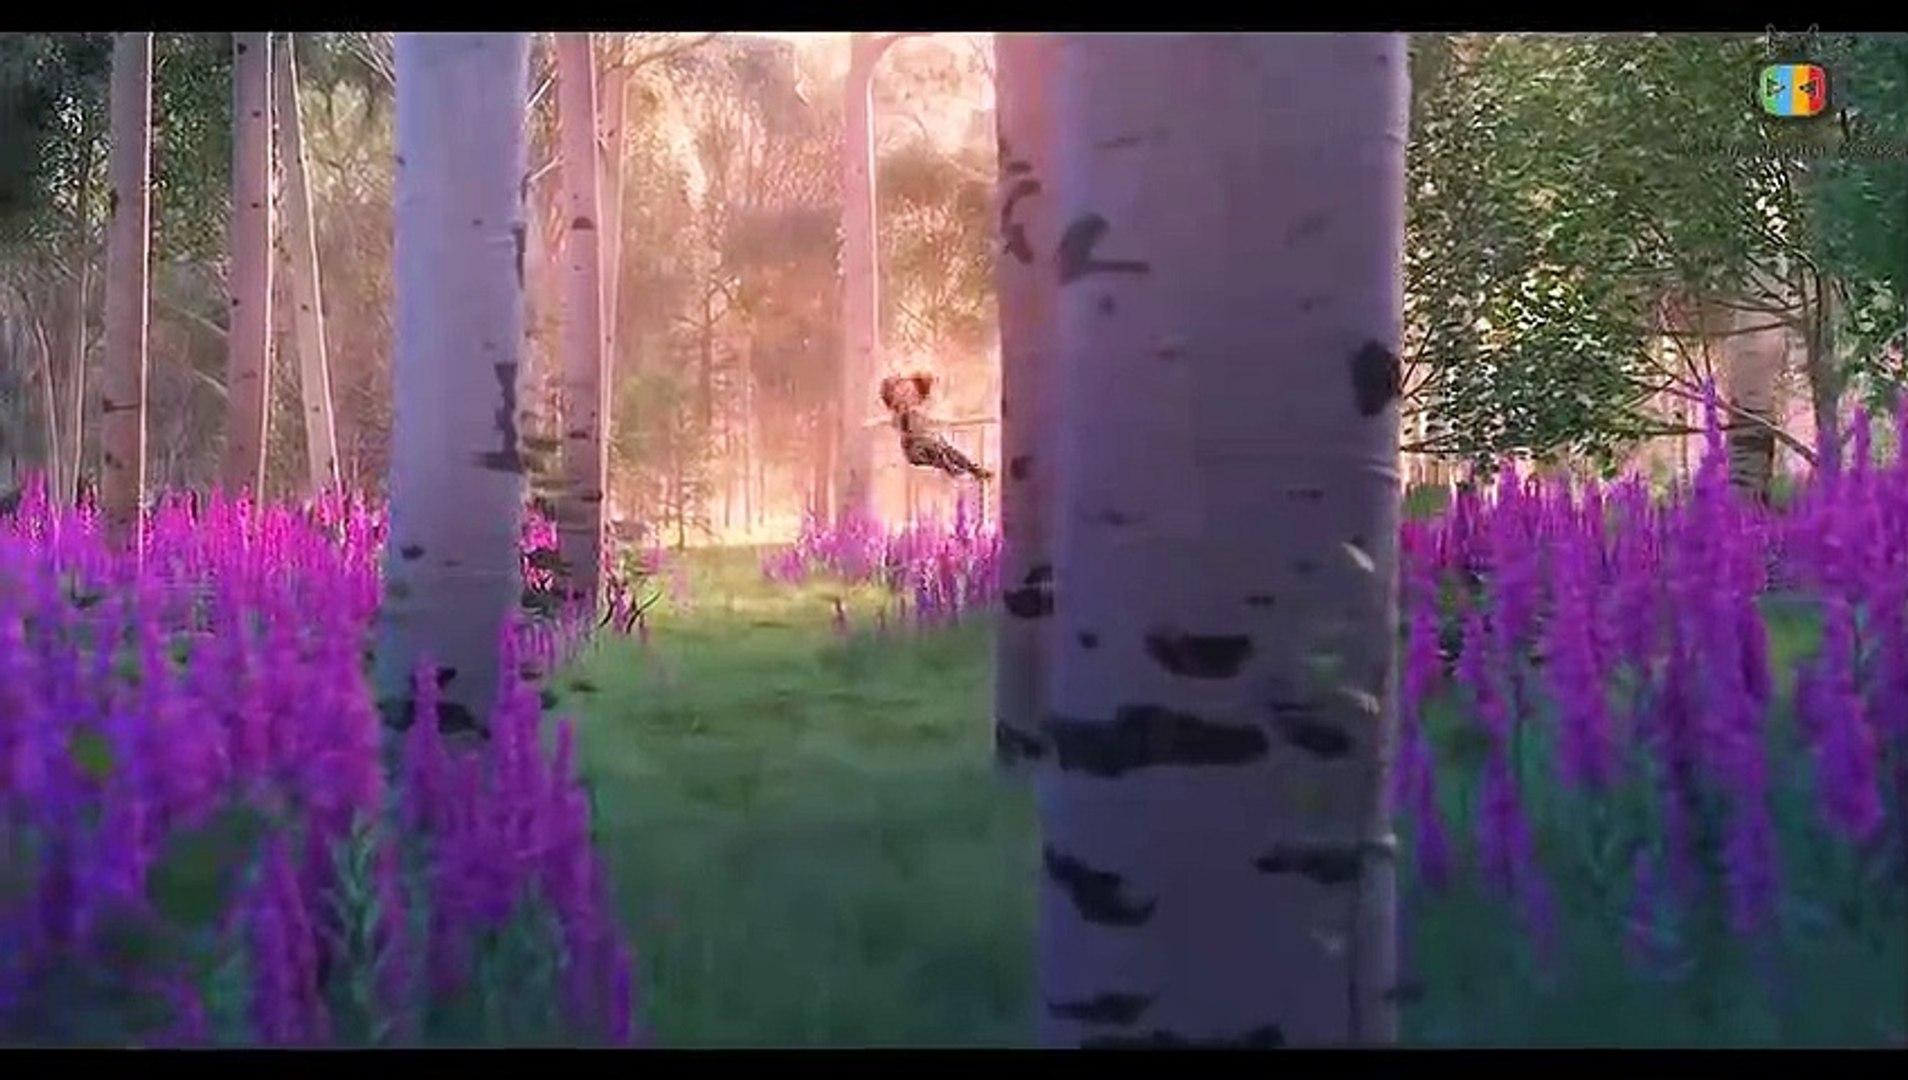 Frozen 2 Official 4K 5 Minute Trailer (NEW 2019)- Kristen Bell Disney Animation UHD